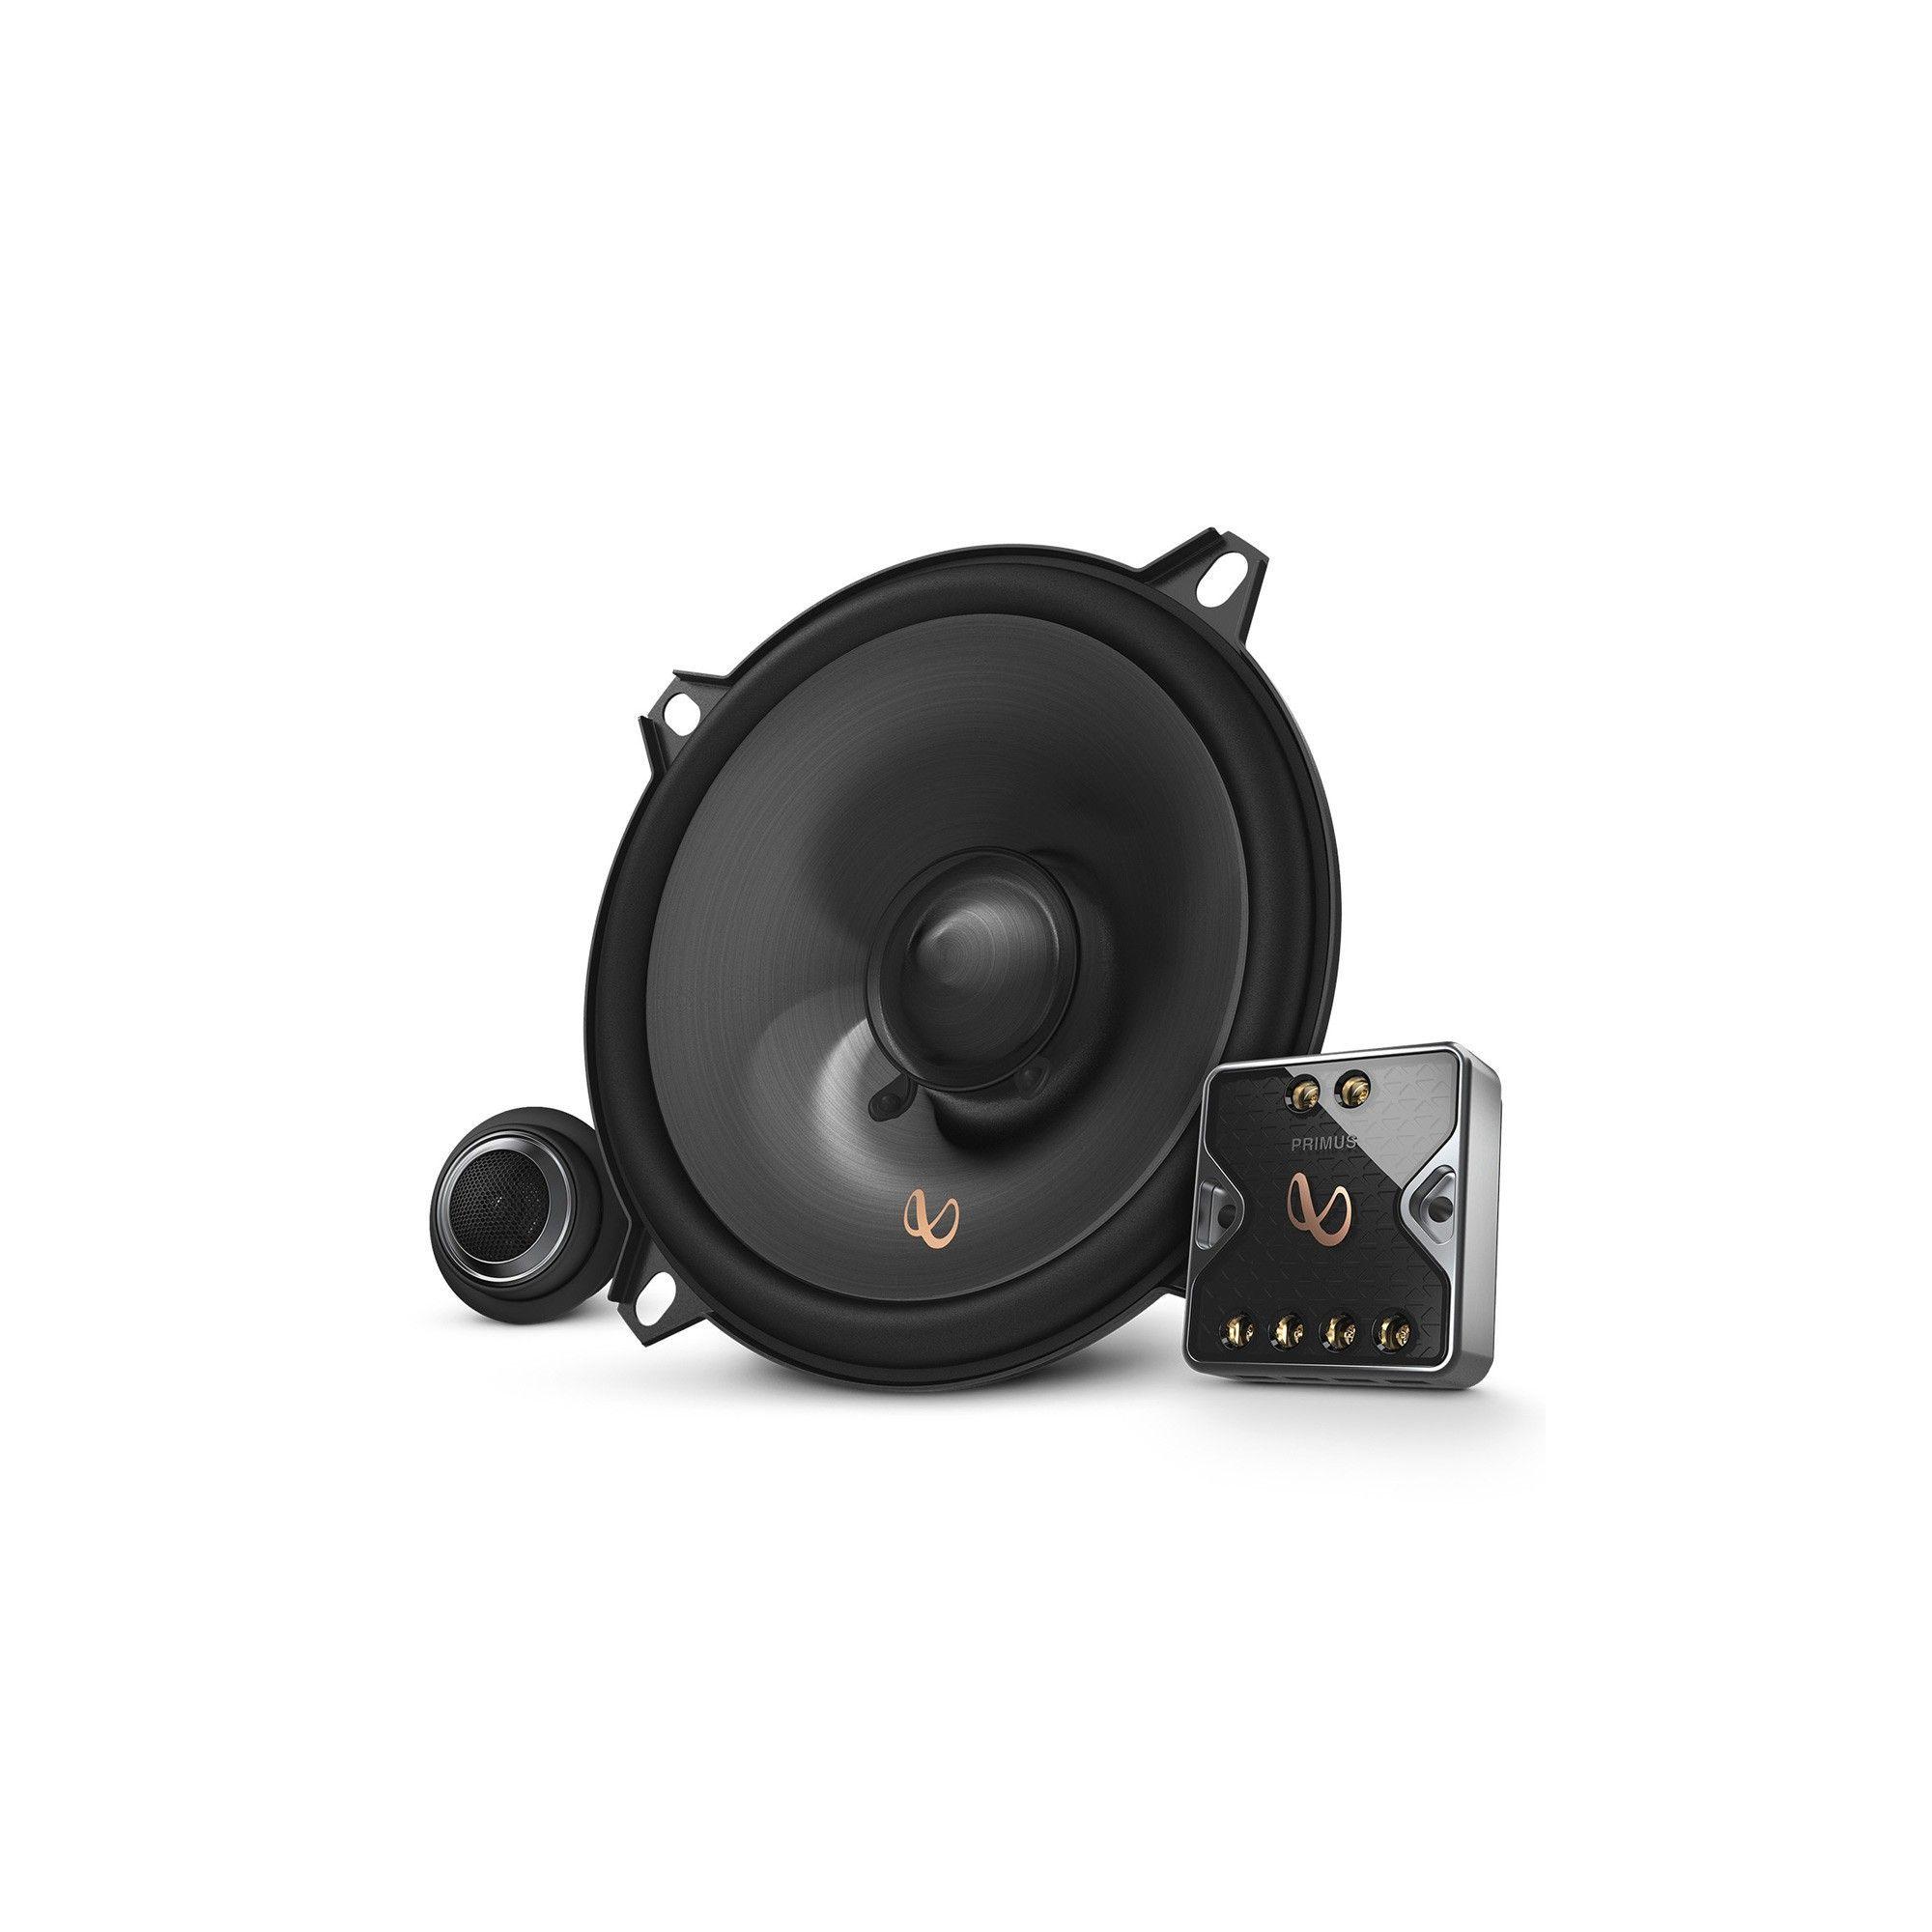 Infinity PR5010cs 5-1/4 2-way Primus Component Speakers - Pair, Black #componentspeakers Infinity PR5010cs 5-1/4 2-way Primus Component Speakers - Pair, Black #componentspeakers